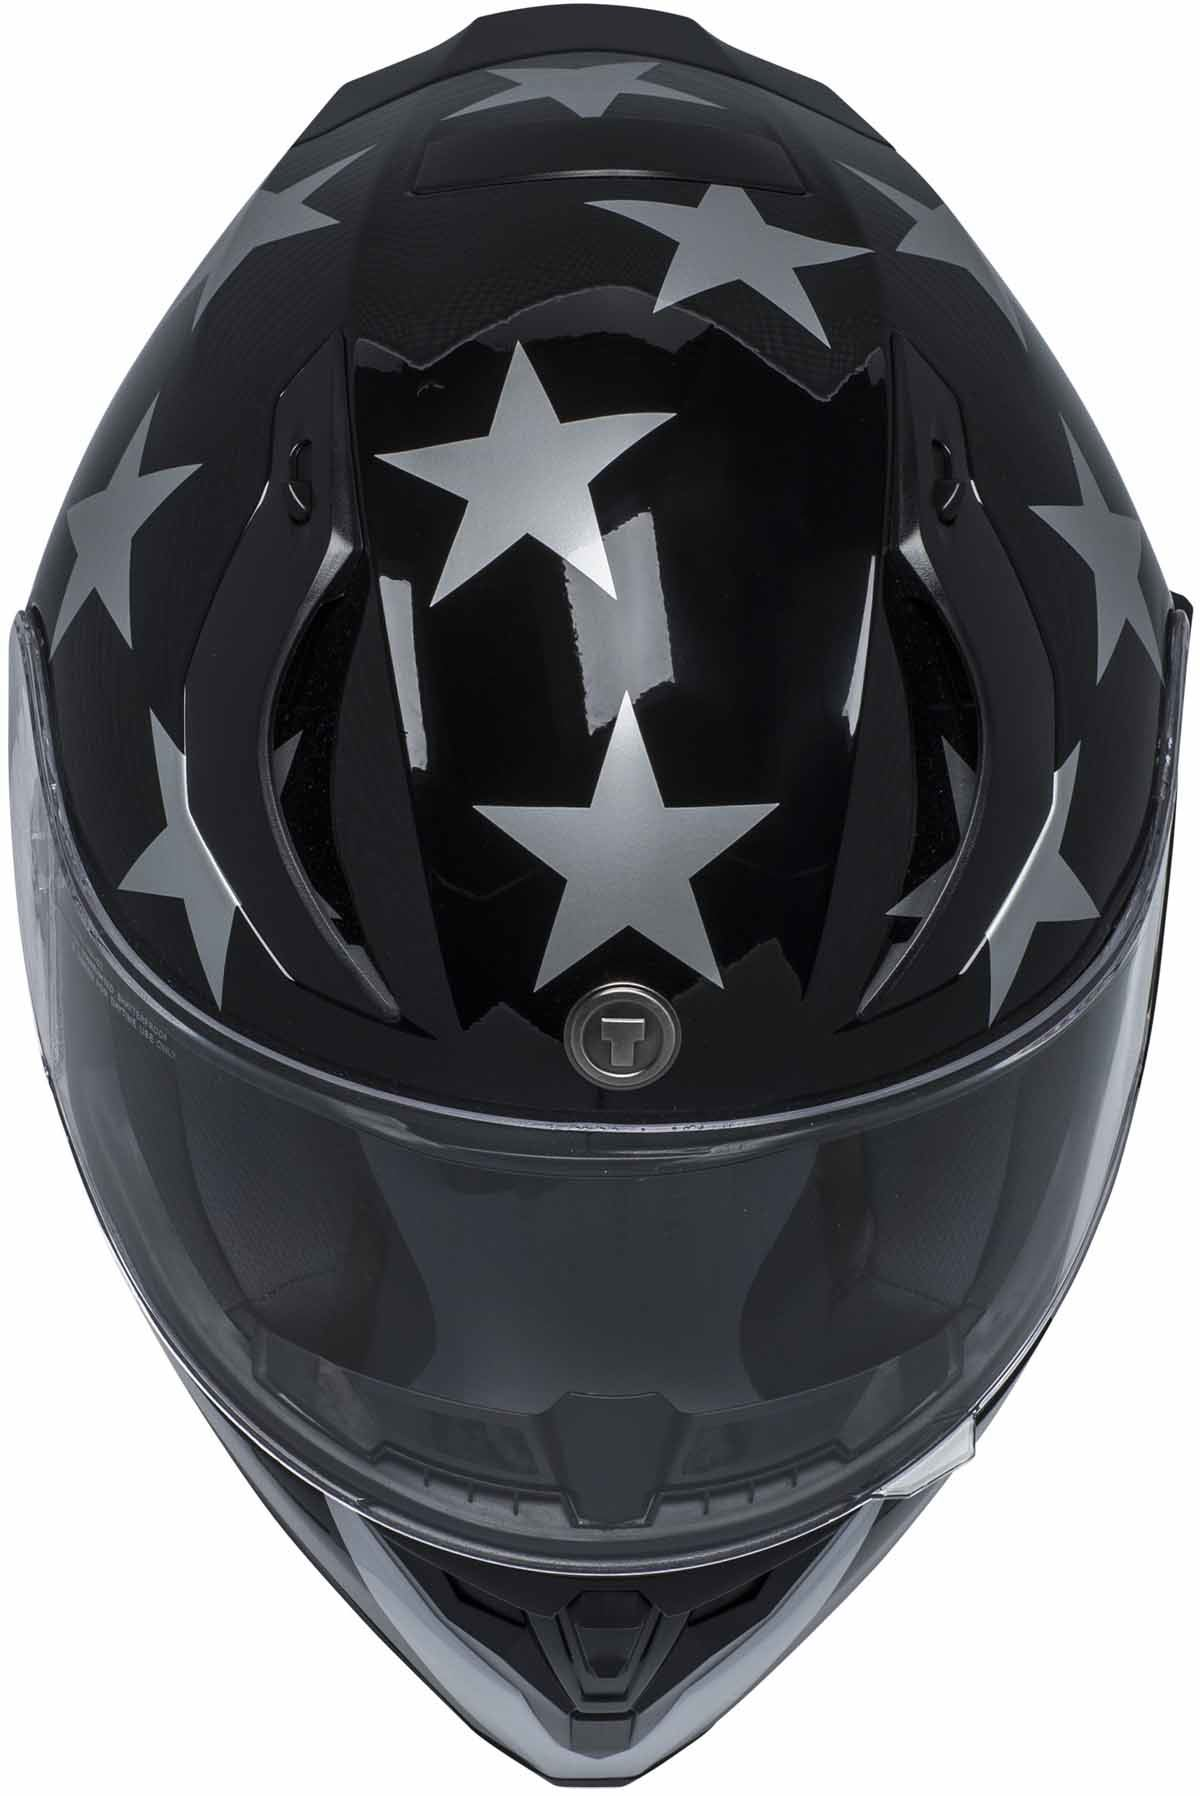 miniature 10 - Torc T15 T15B Helmet Bluetooth Blinc or without - Inner Sun Shield DOT XS-2XL